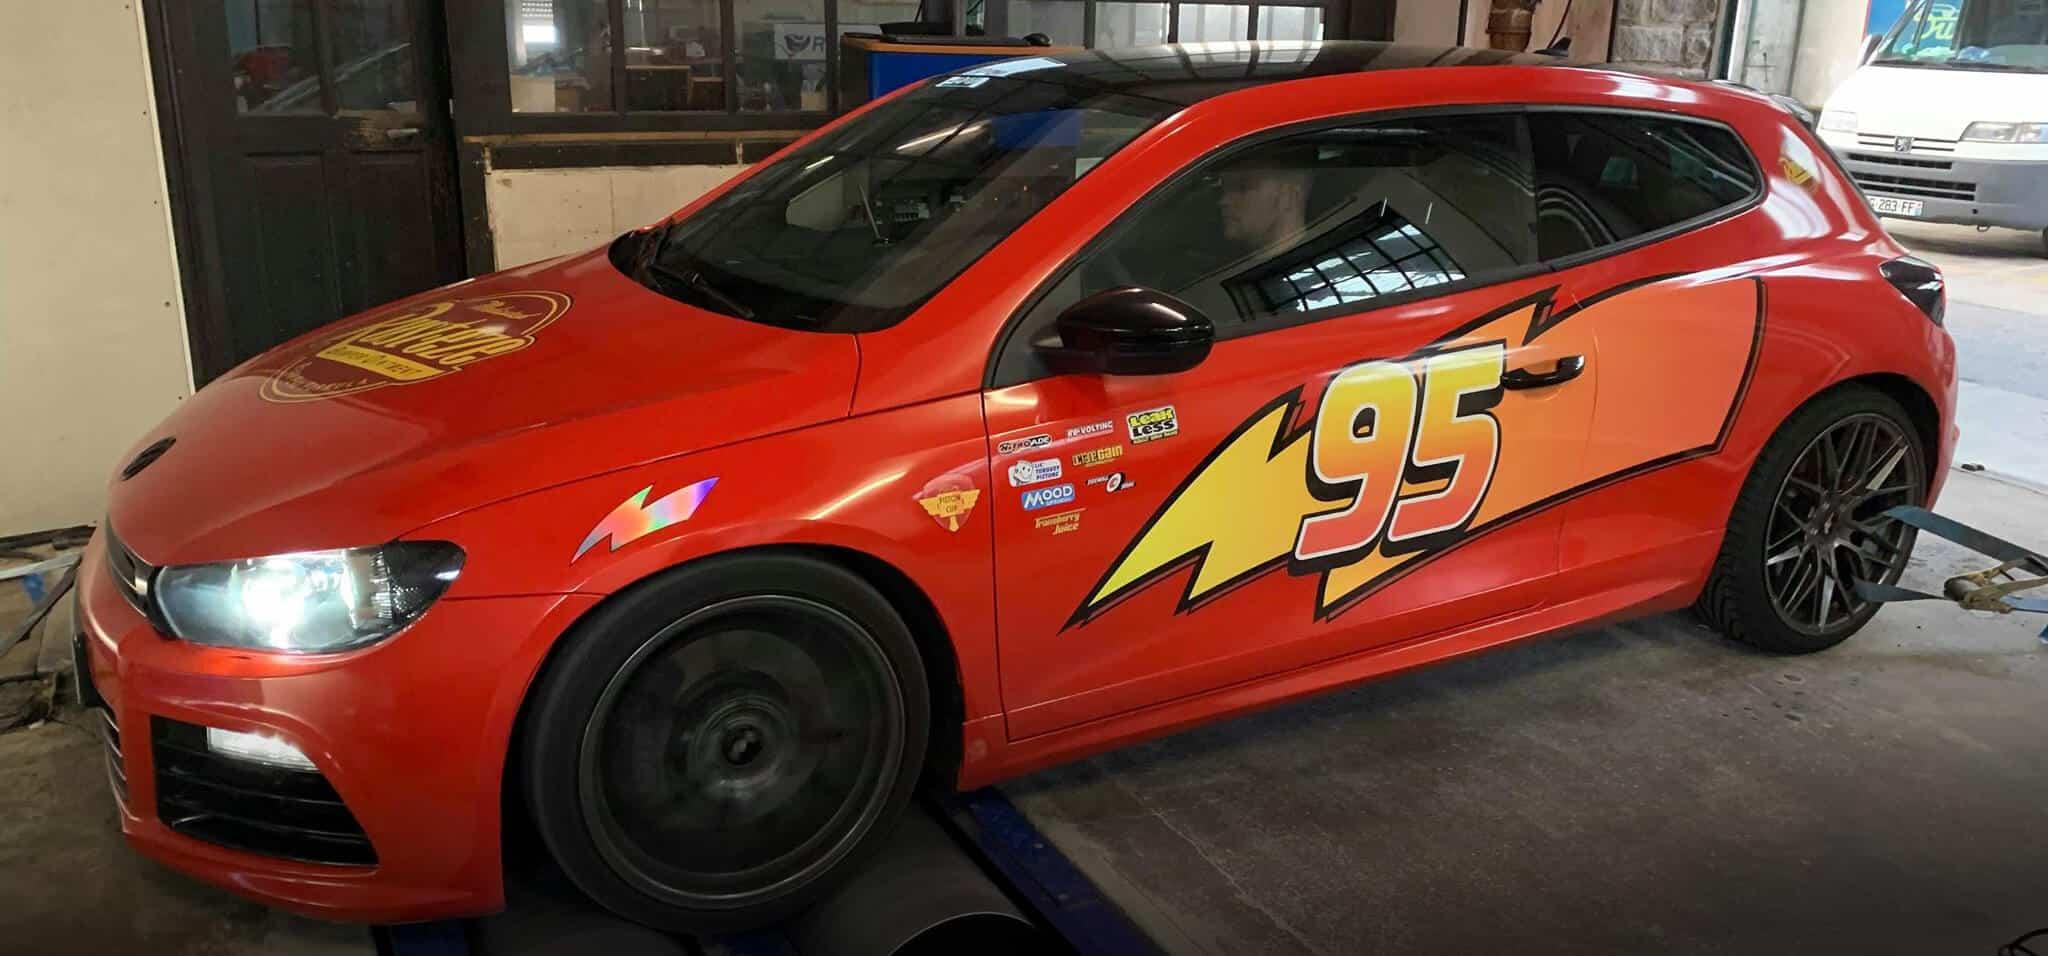 armada-racing-prepration-echappement-titane-Nissan-GTR-Slider